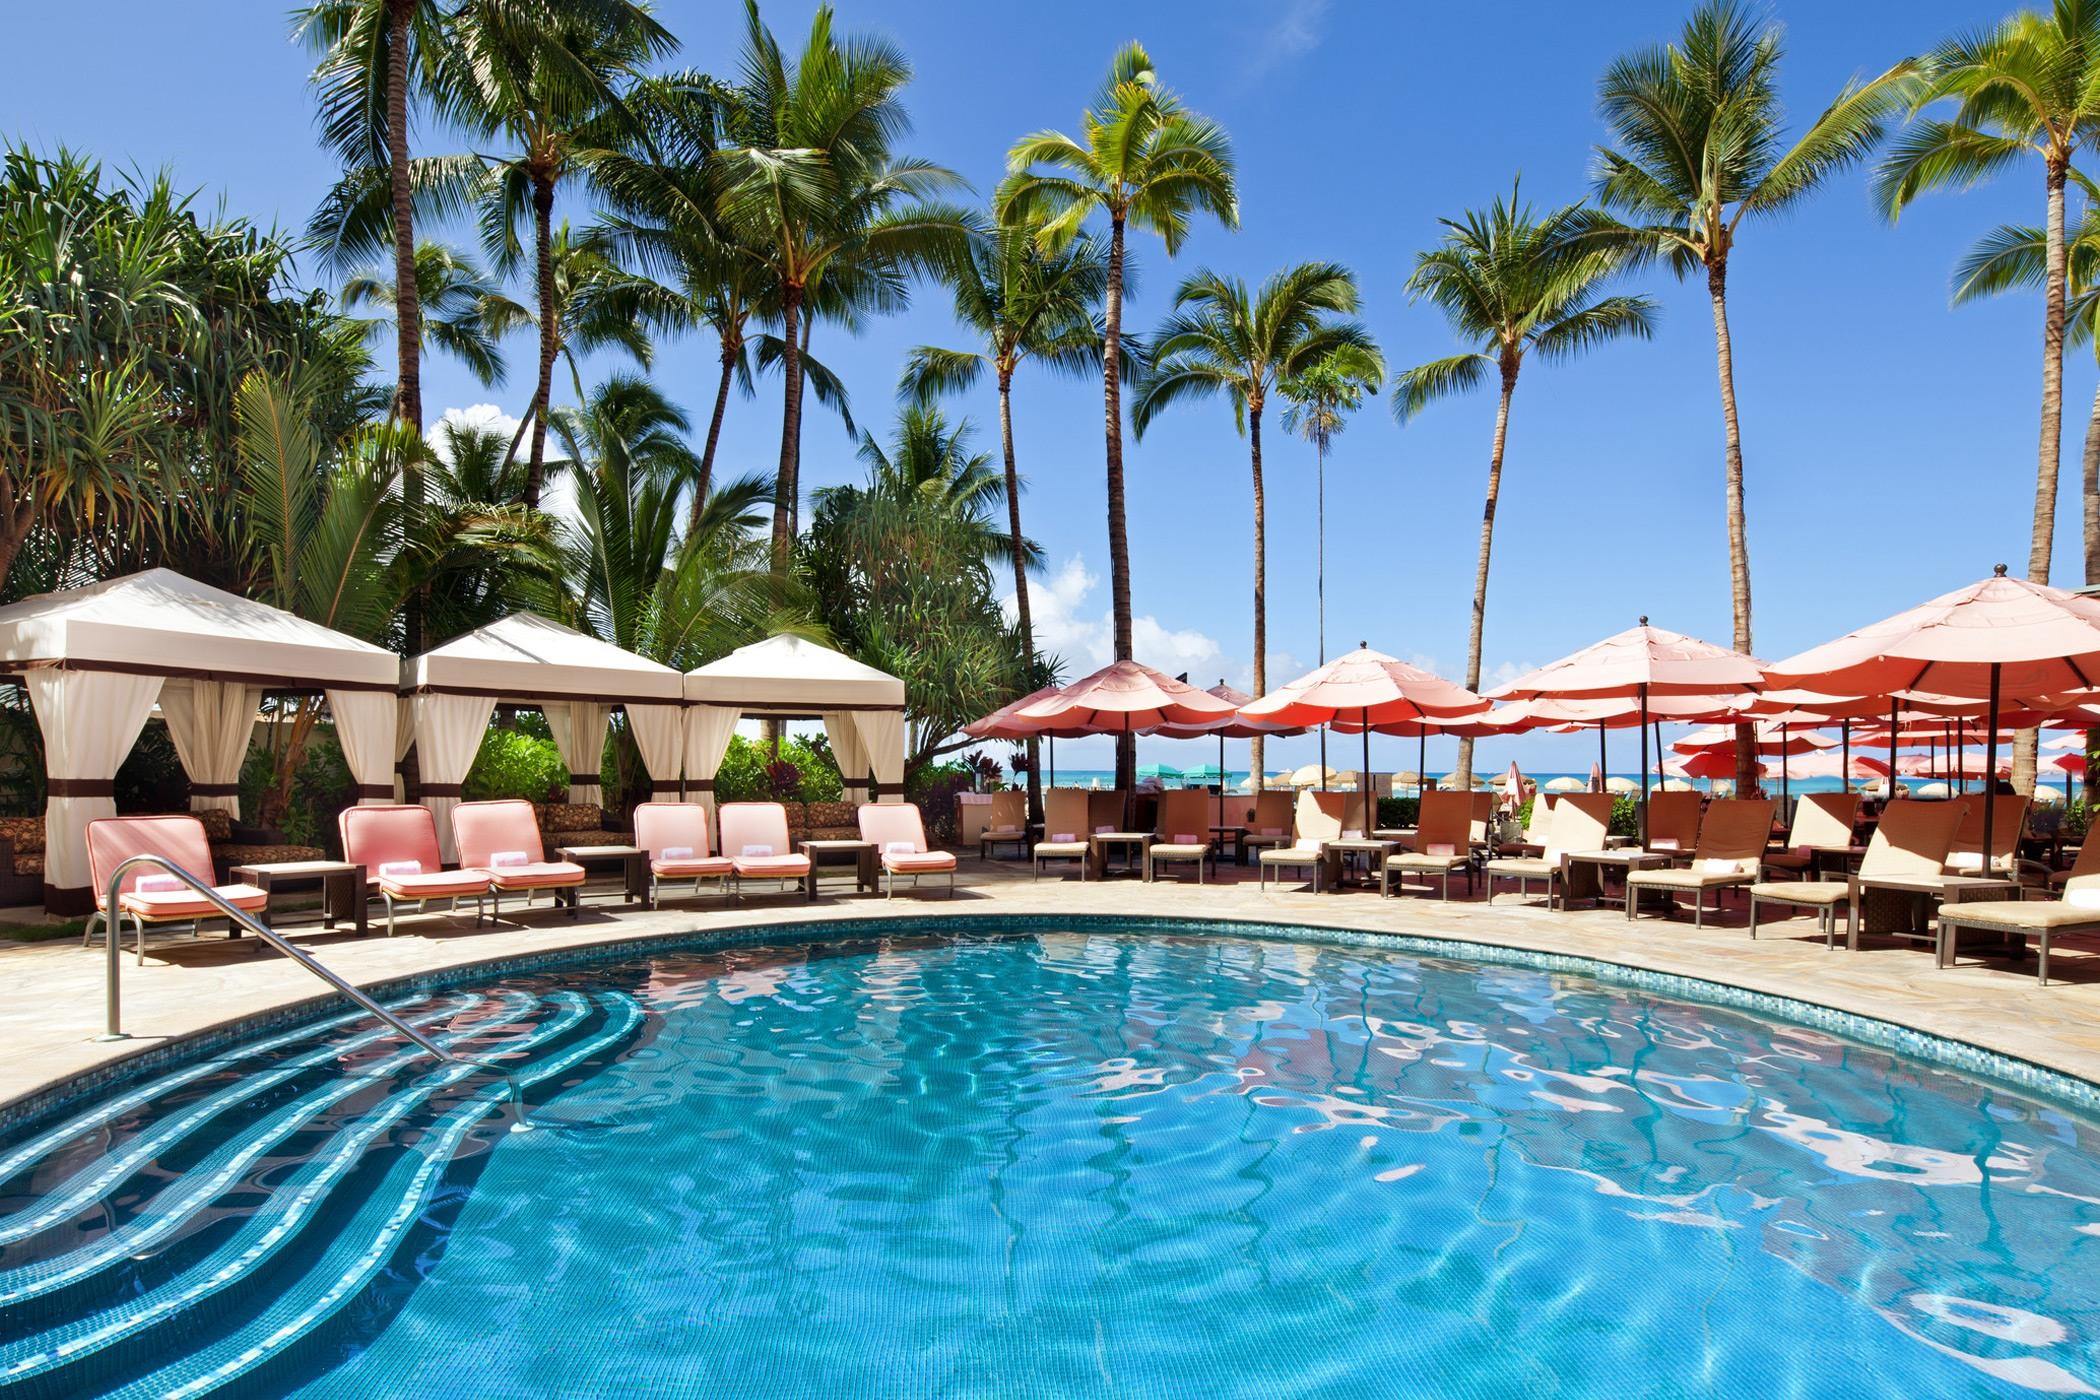 Pool Beach Services The Royal Hawaiian